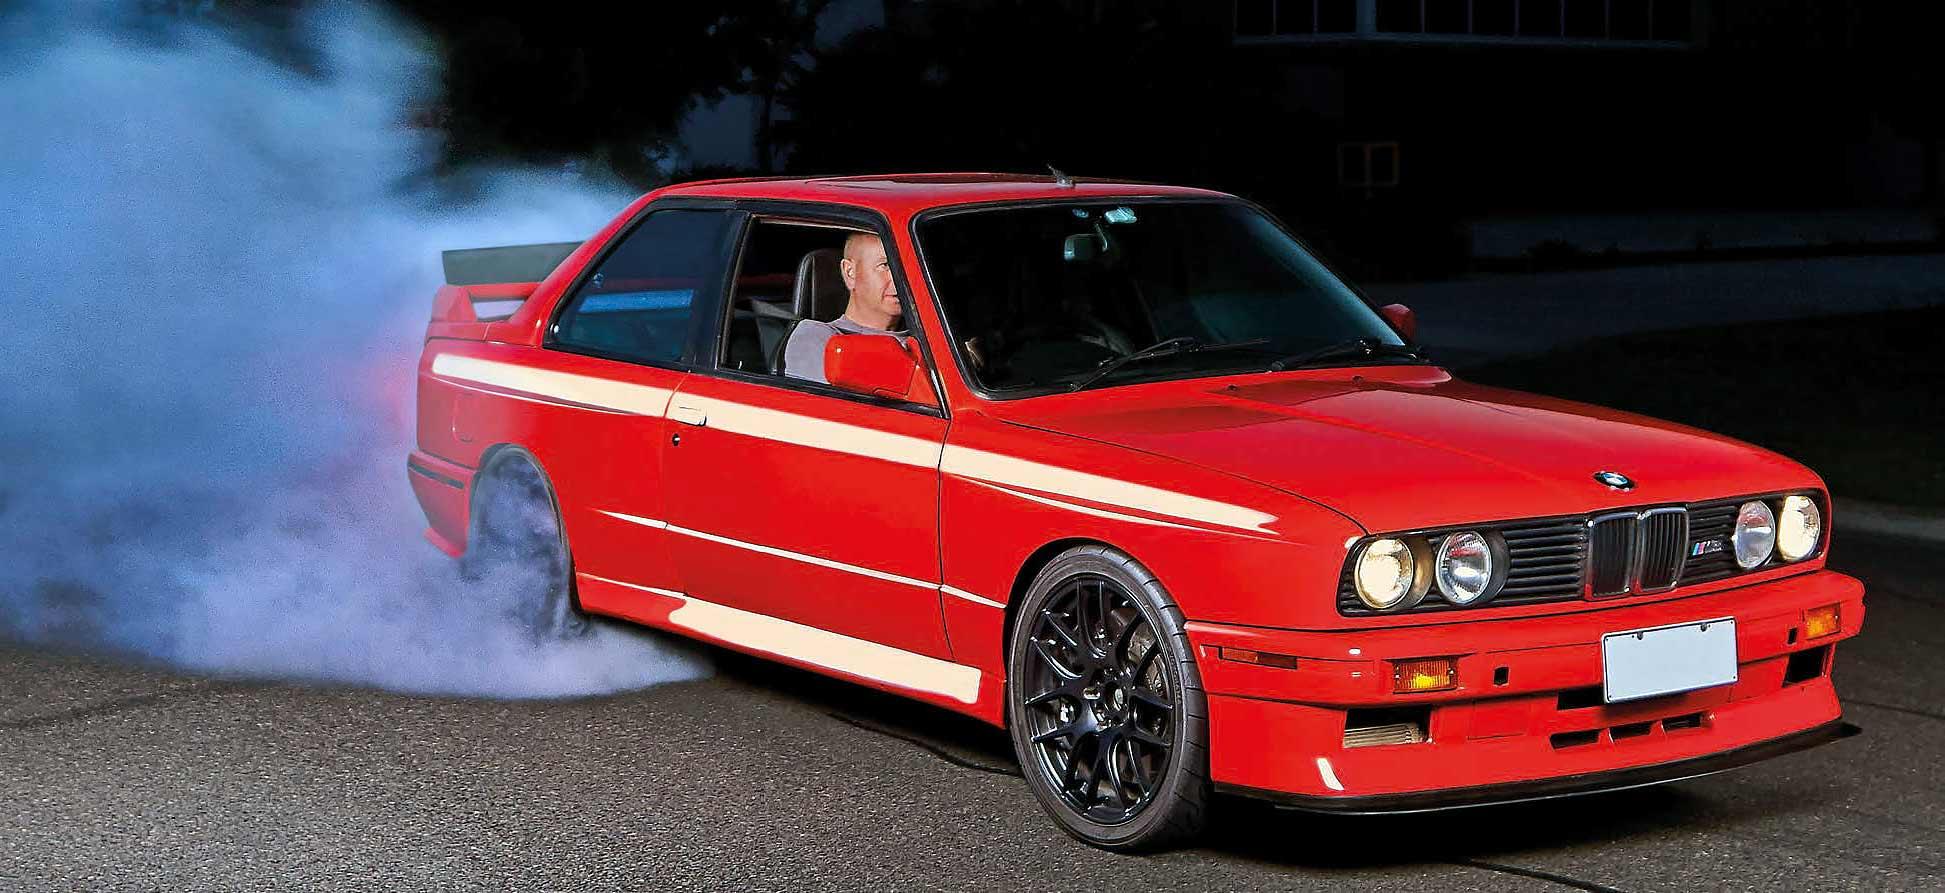 BMW E30 M3 >> 500hp 5 8 Litre S85b50 V10 Swapped Bmw E30 M3 Drive My